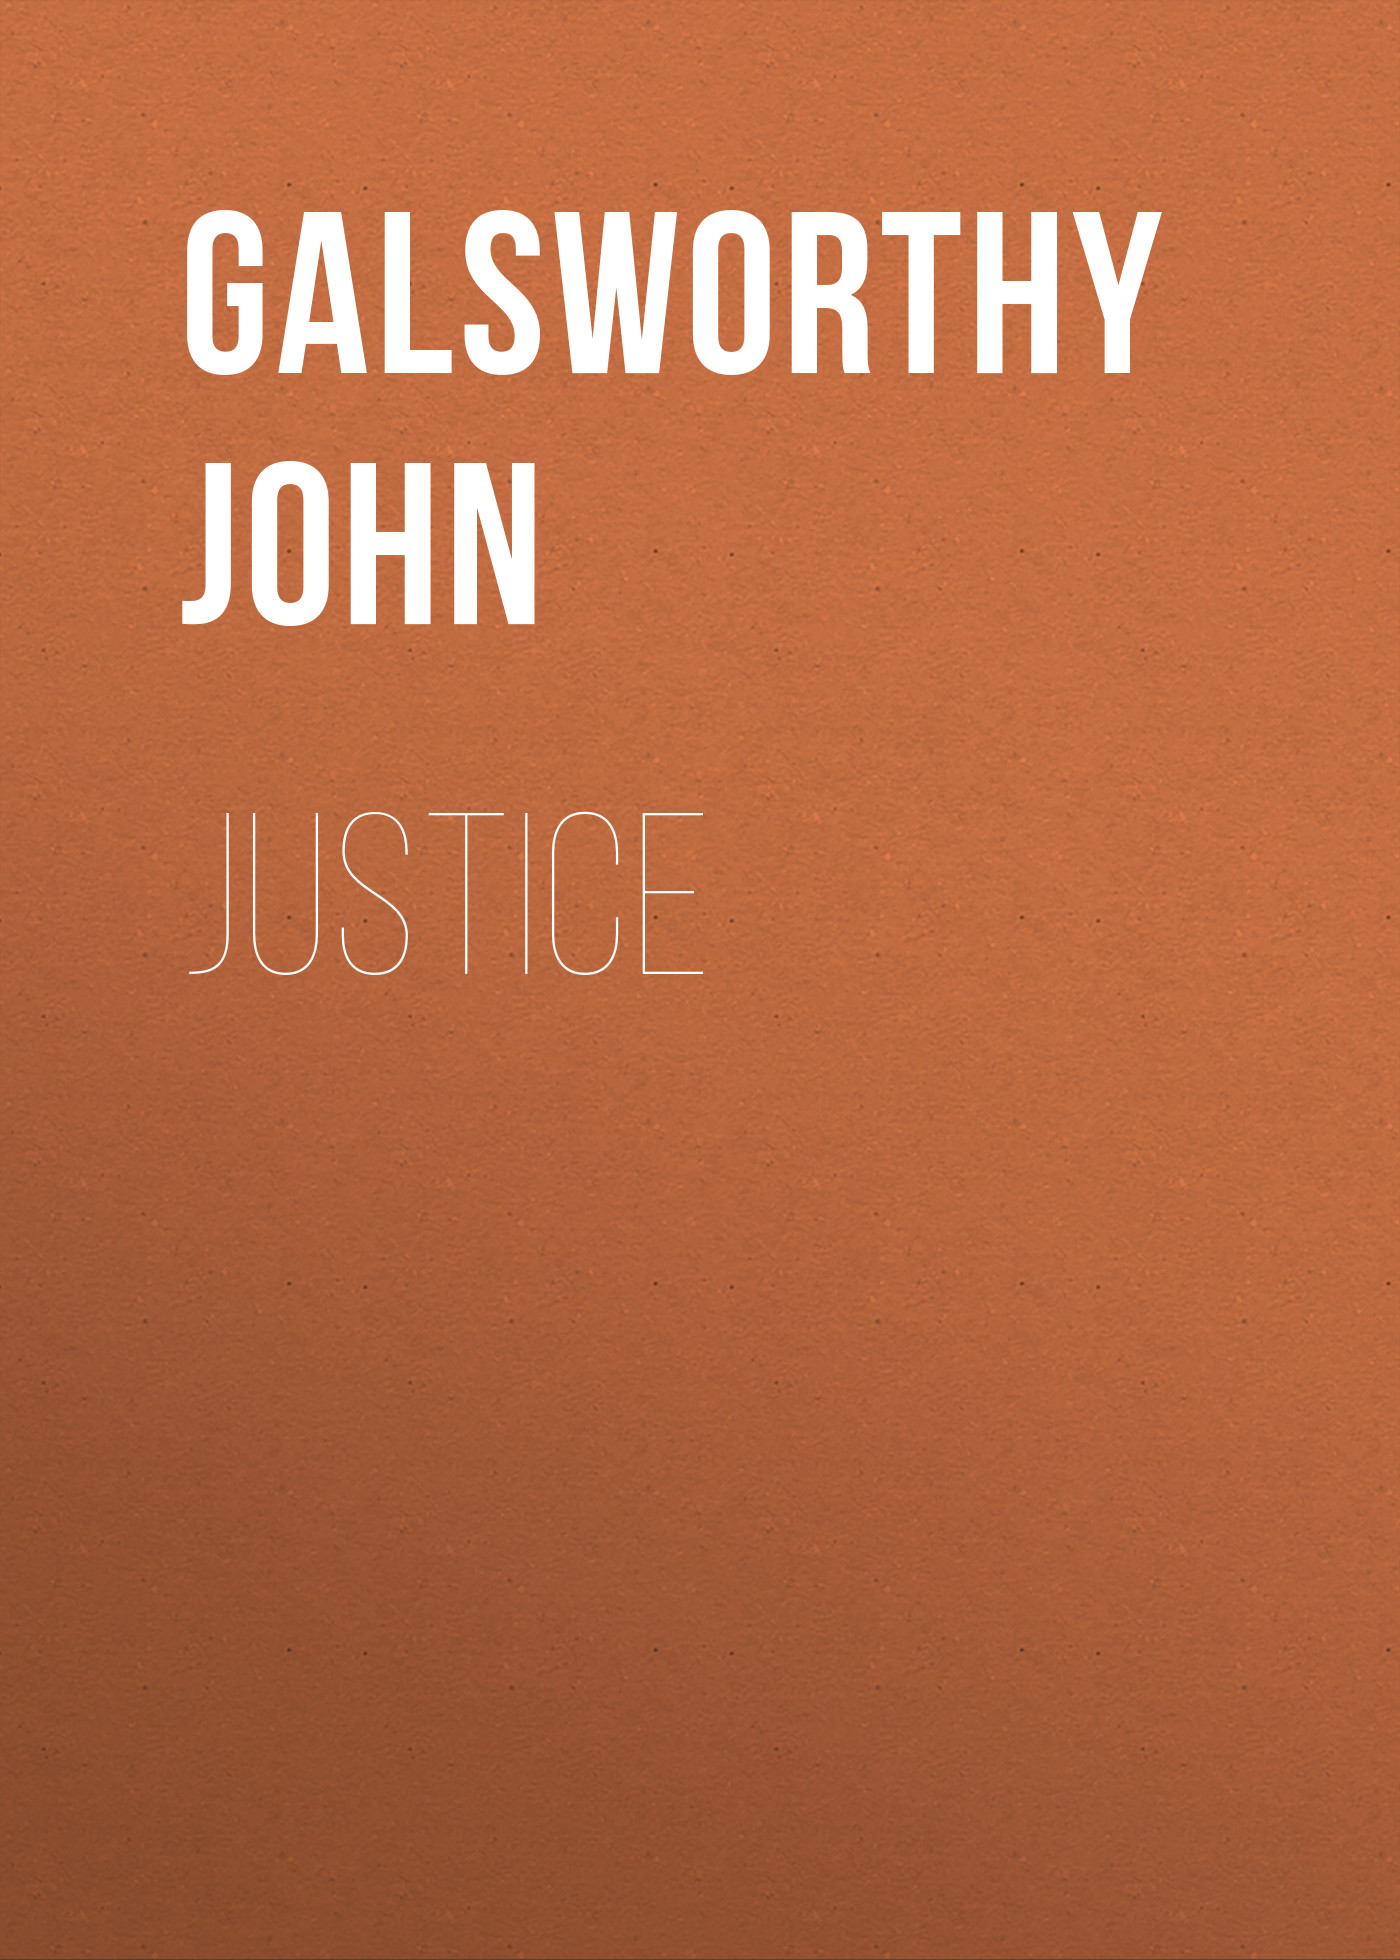 Galsworthy John Justice denn dks001 стойка для синтезатора